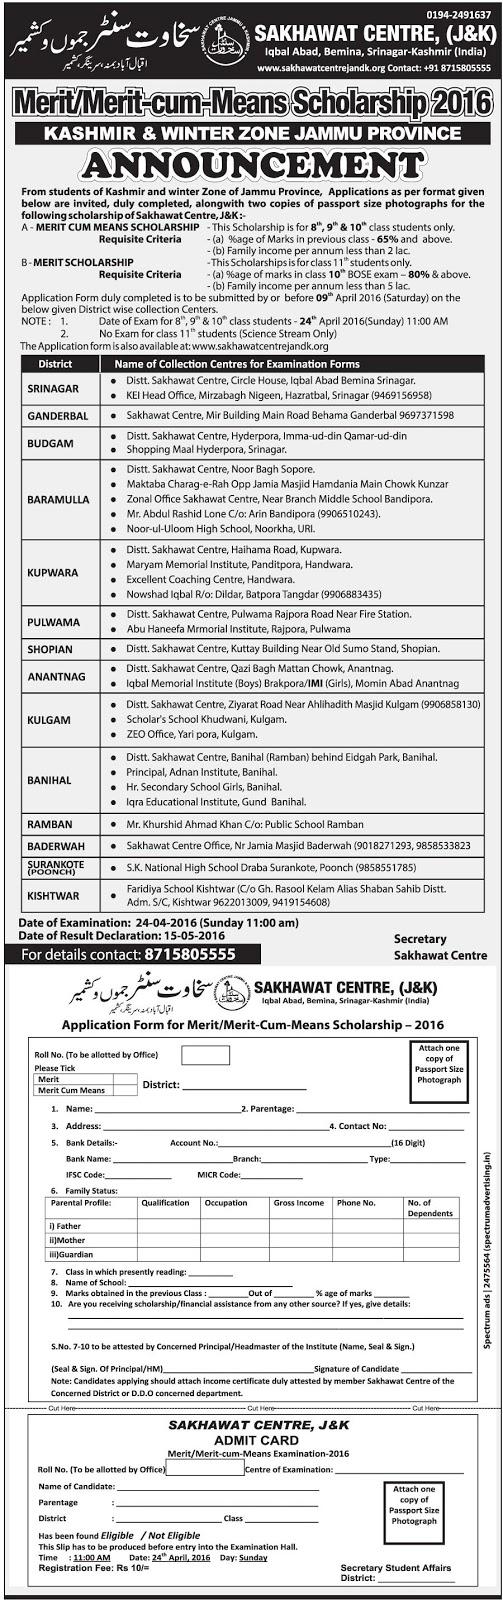 Sakhawat Centre (J&K) - Merit-cum-Means Scholarship 2016